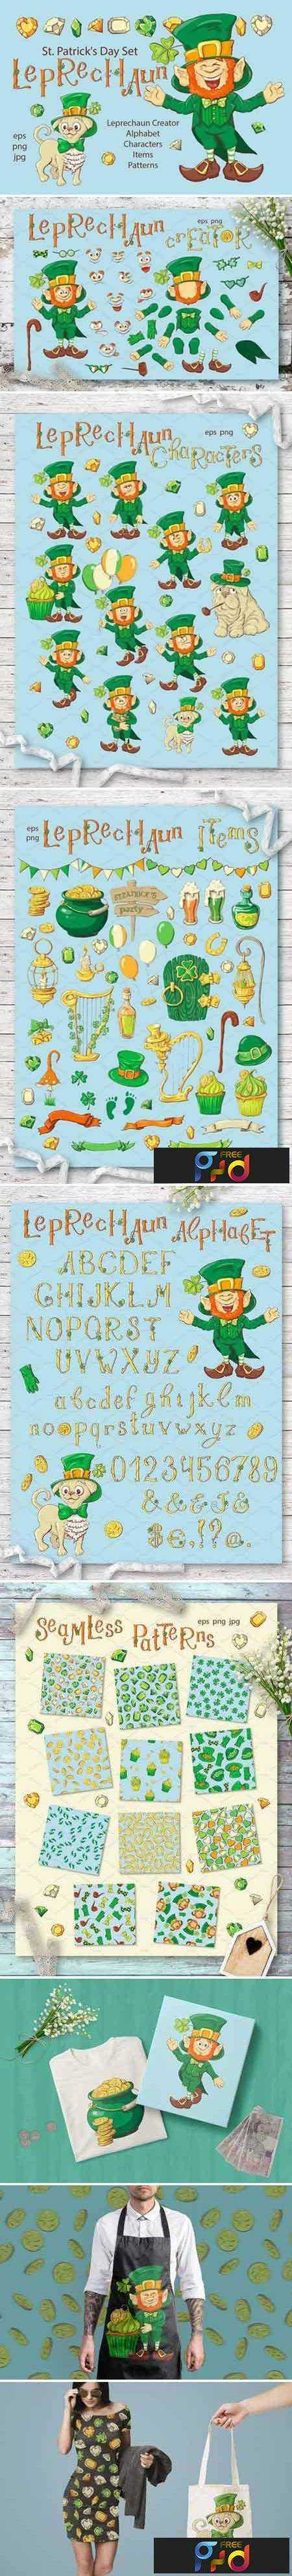 1804238 Leprechaun – St. Patrick's Day Set 2231895 1